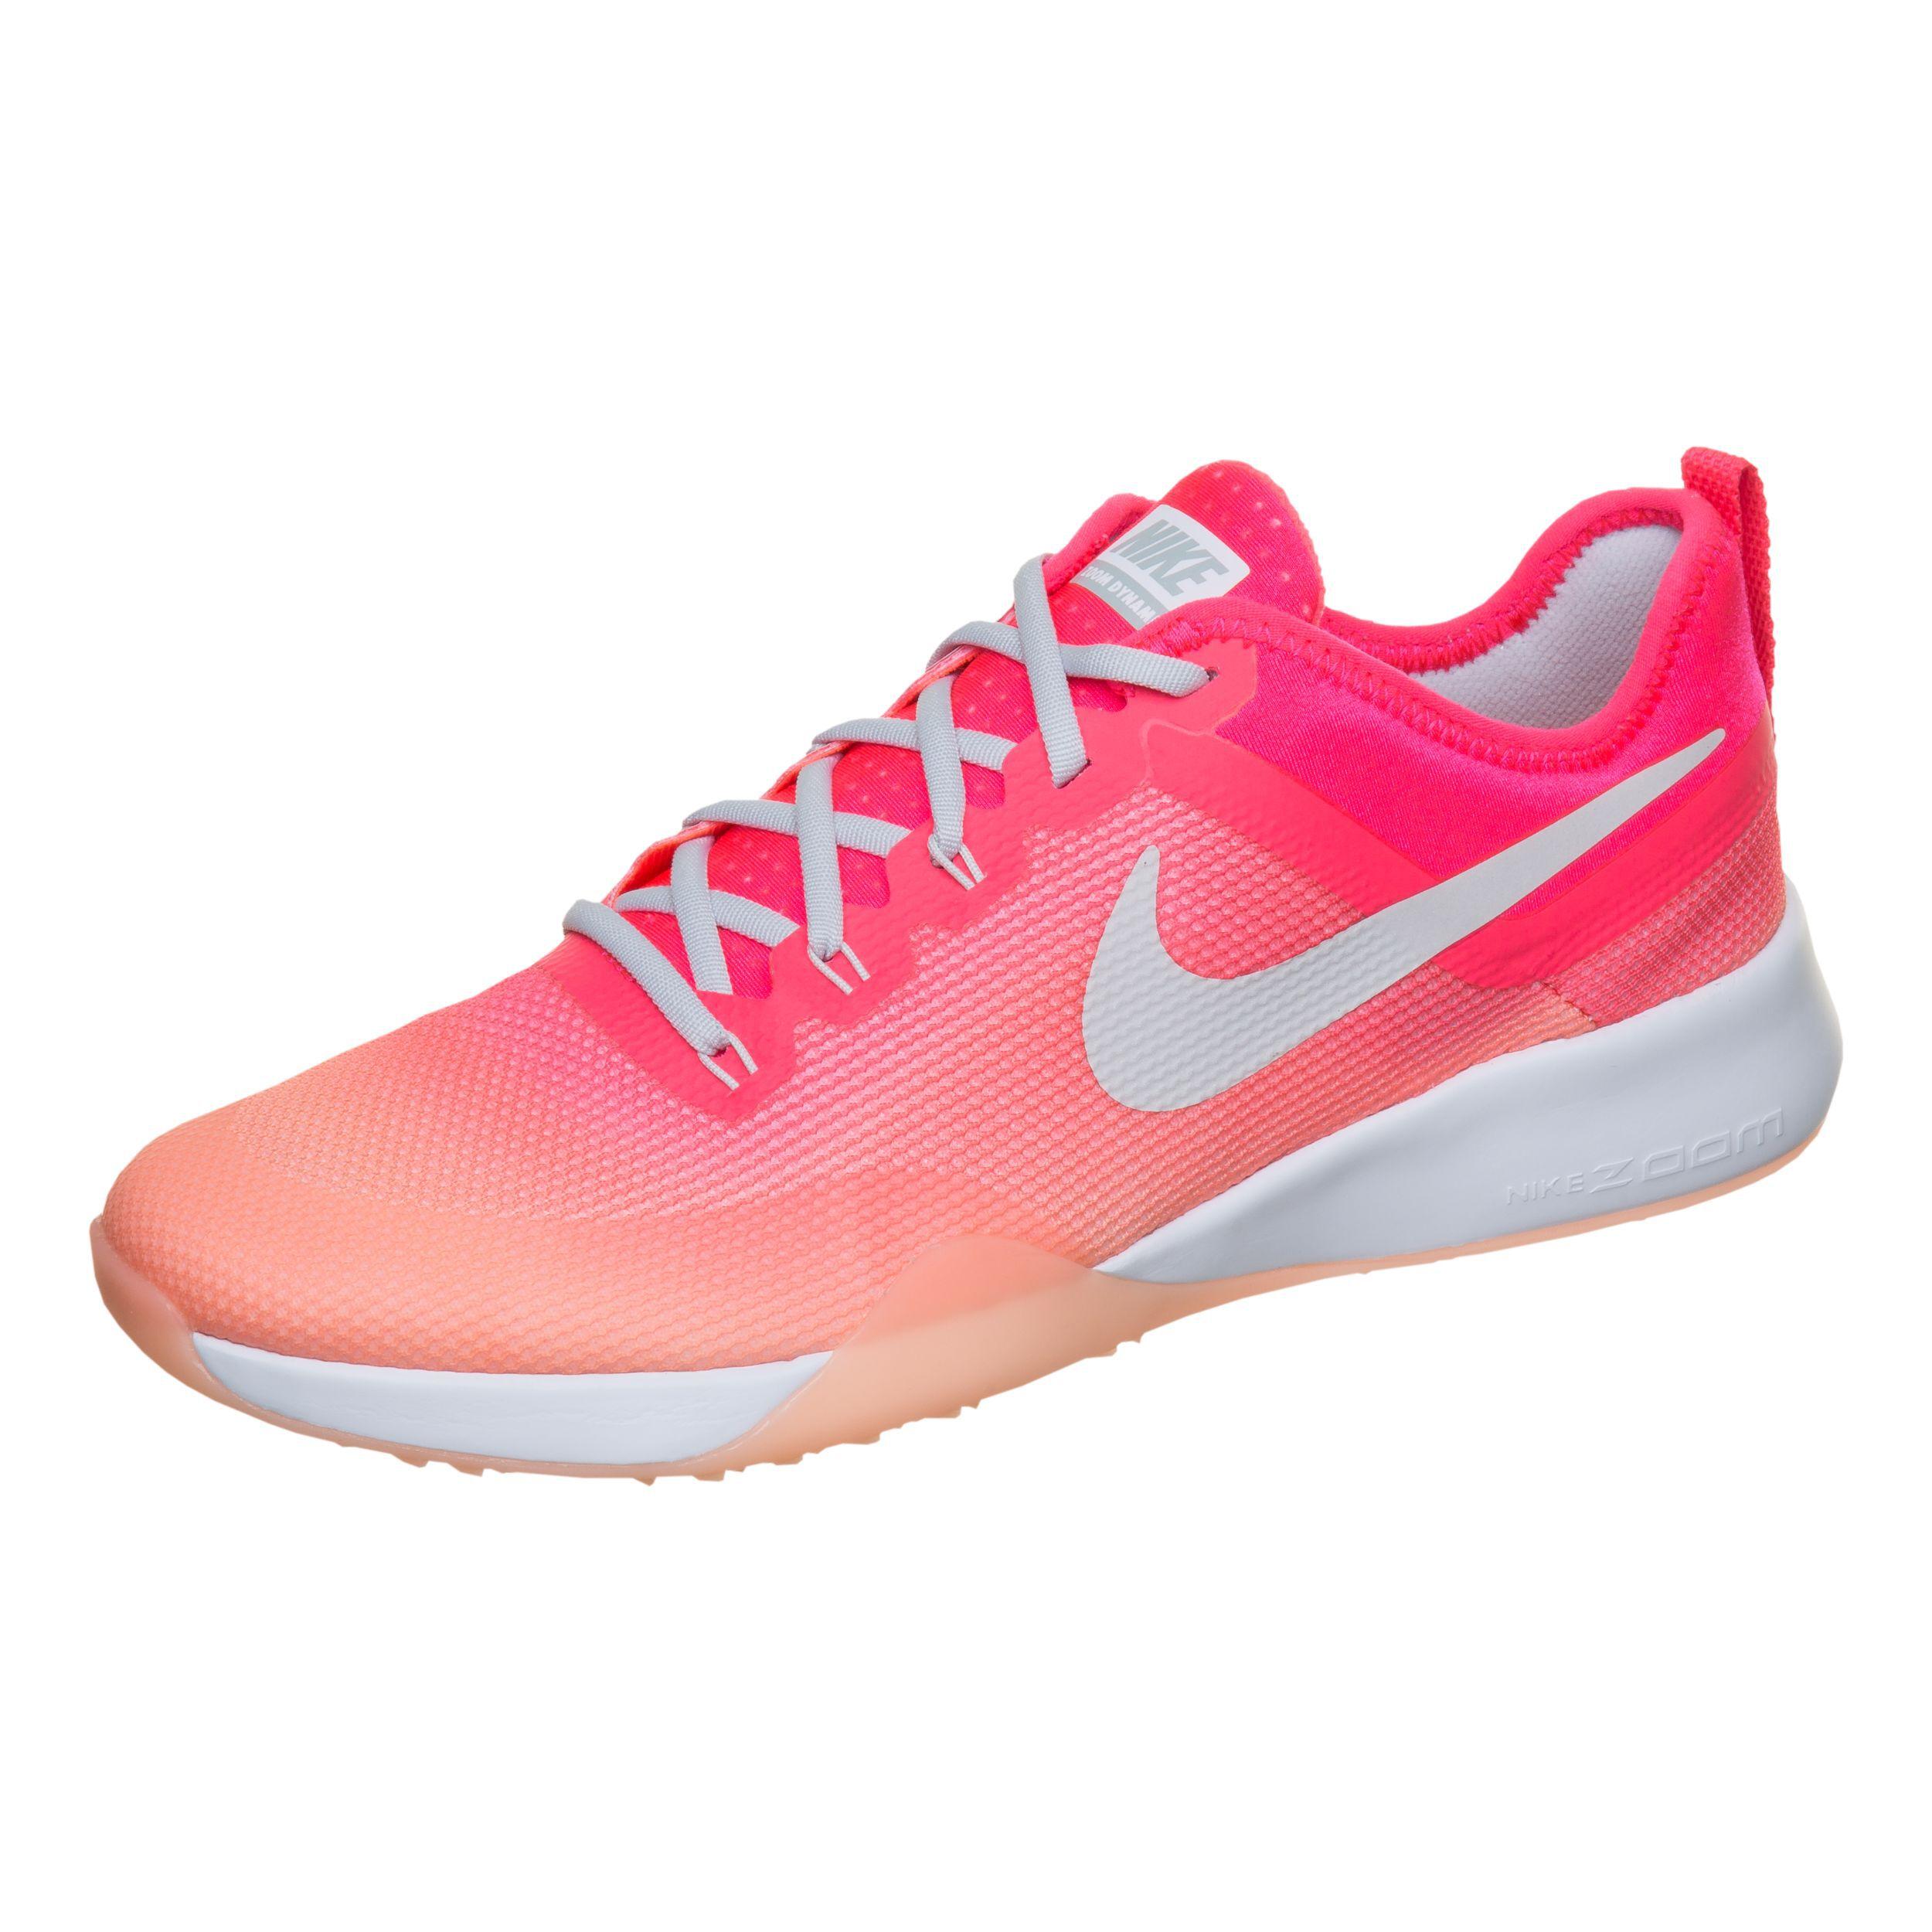 Running Nike Air Max 1 CMFT Premium Tape Herren Damen's